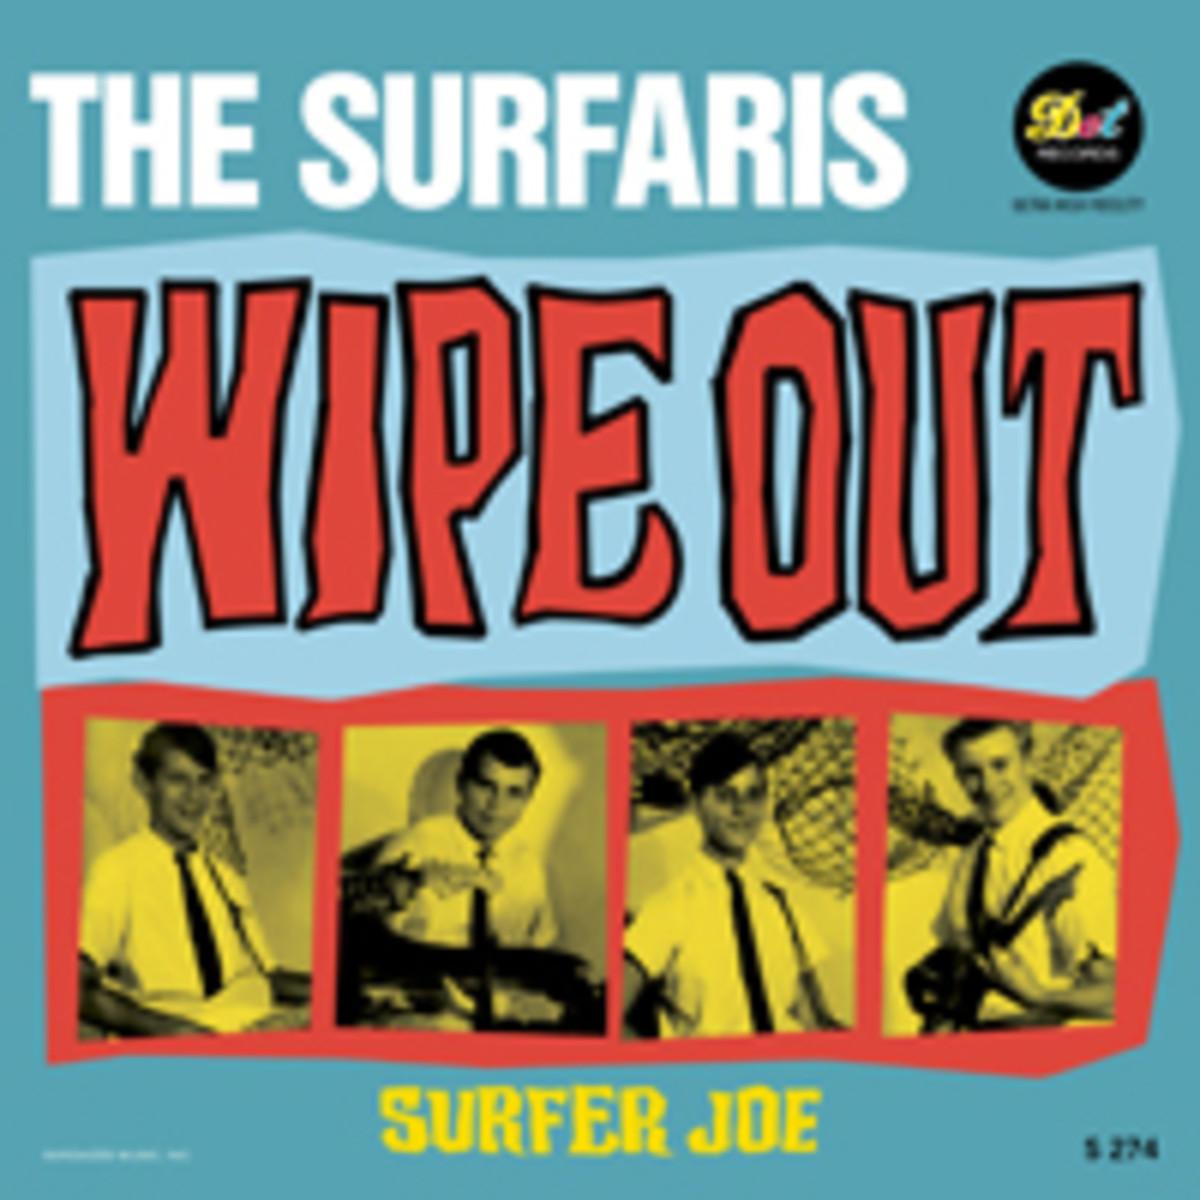 Surfaris Wipe out Surfer Joe Picture Sleeve